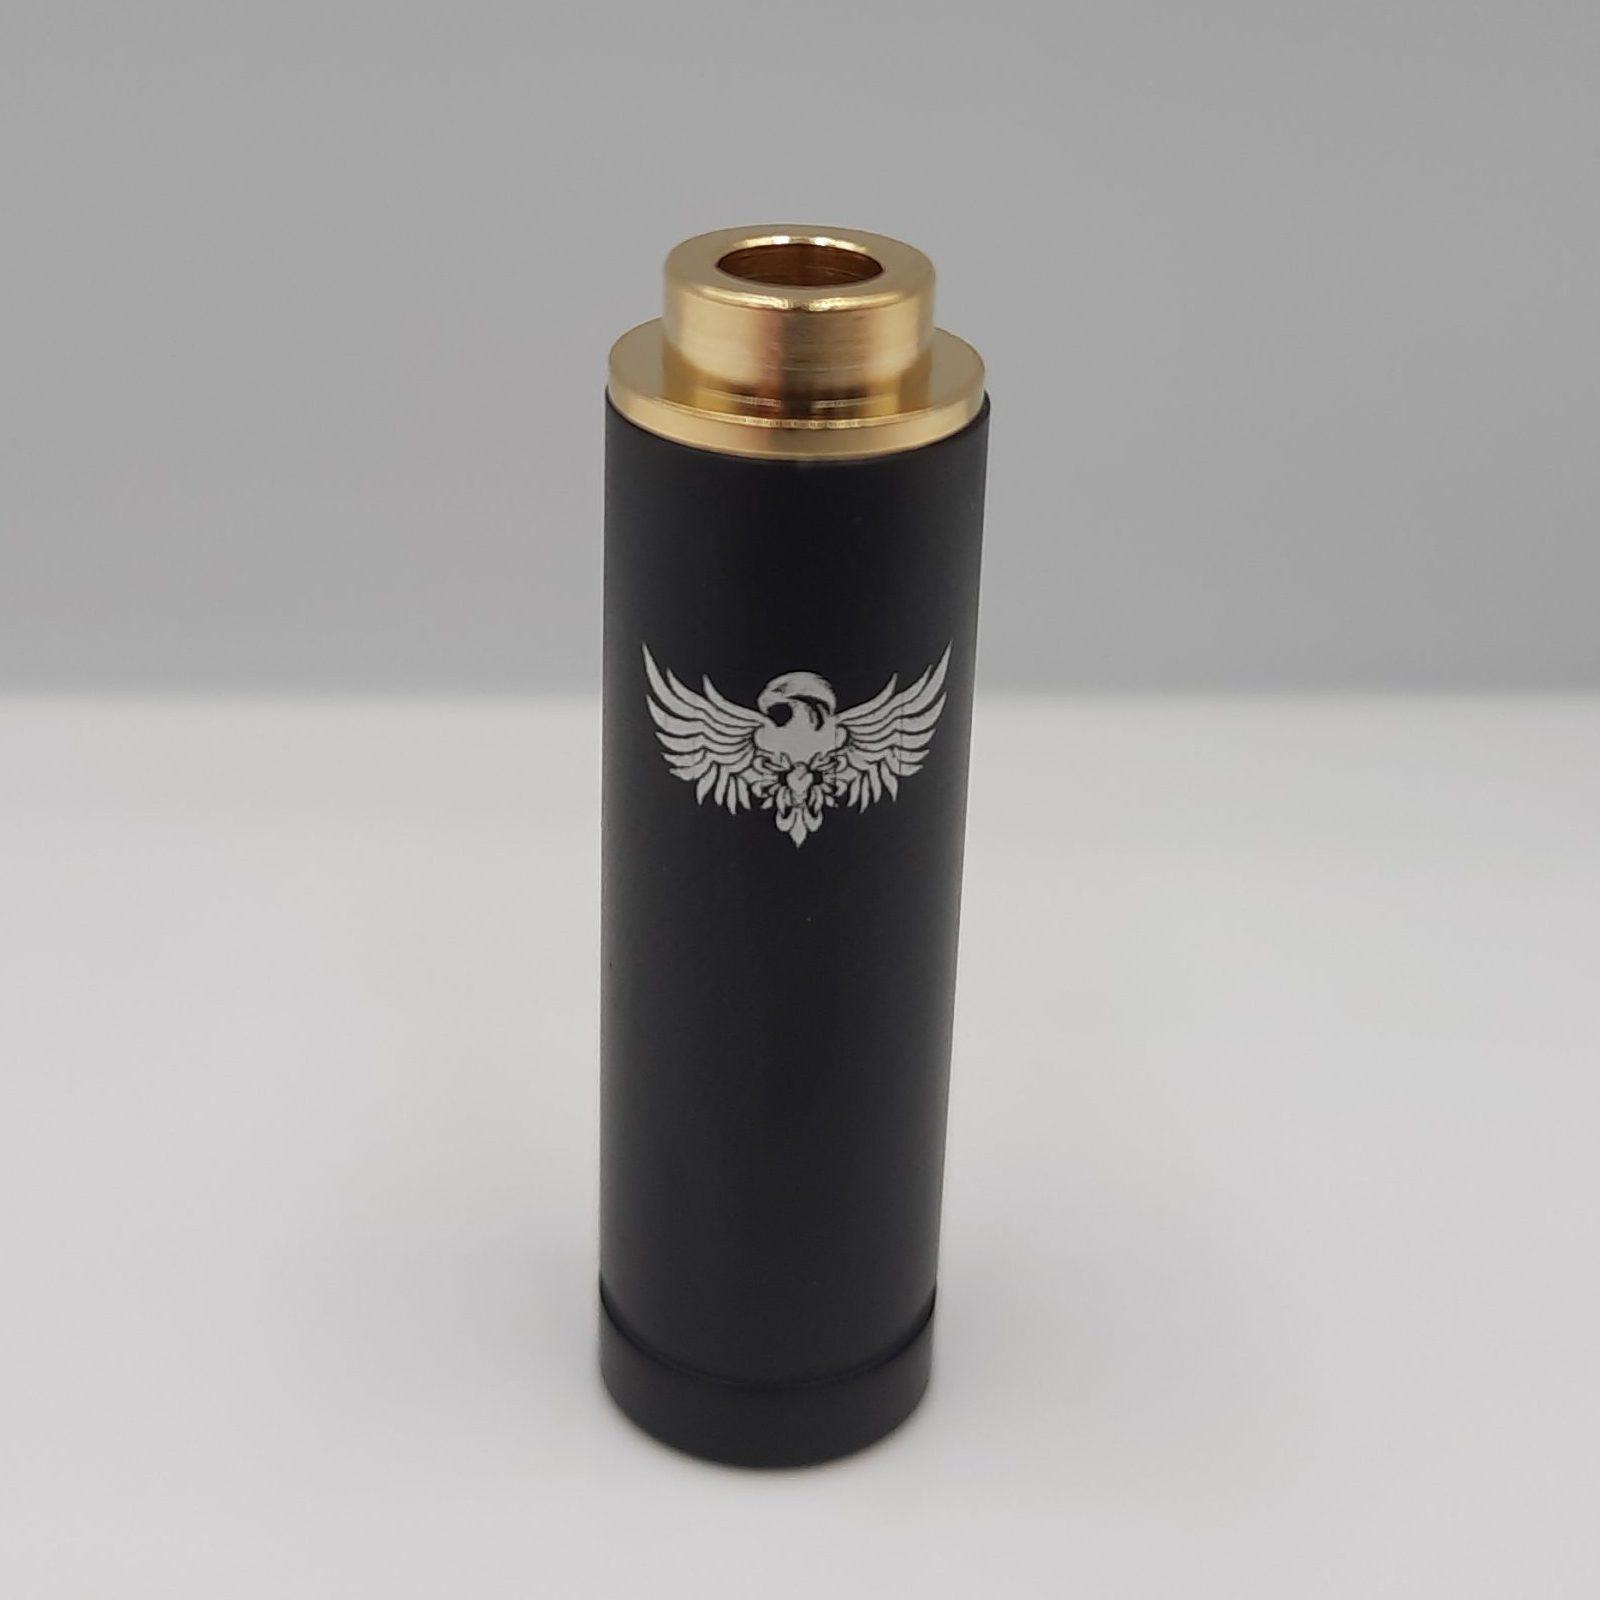 4.4mm Pentaconn Buchse Premium